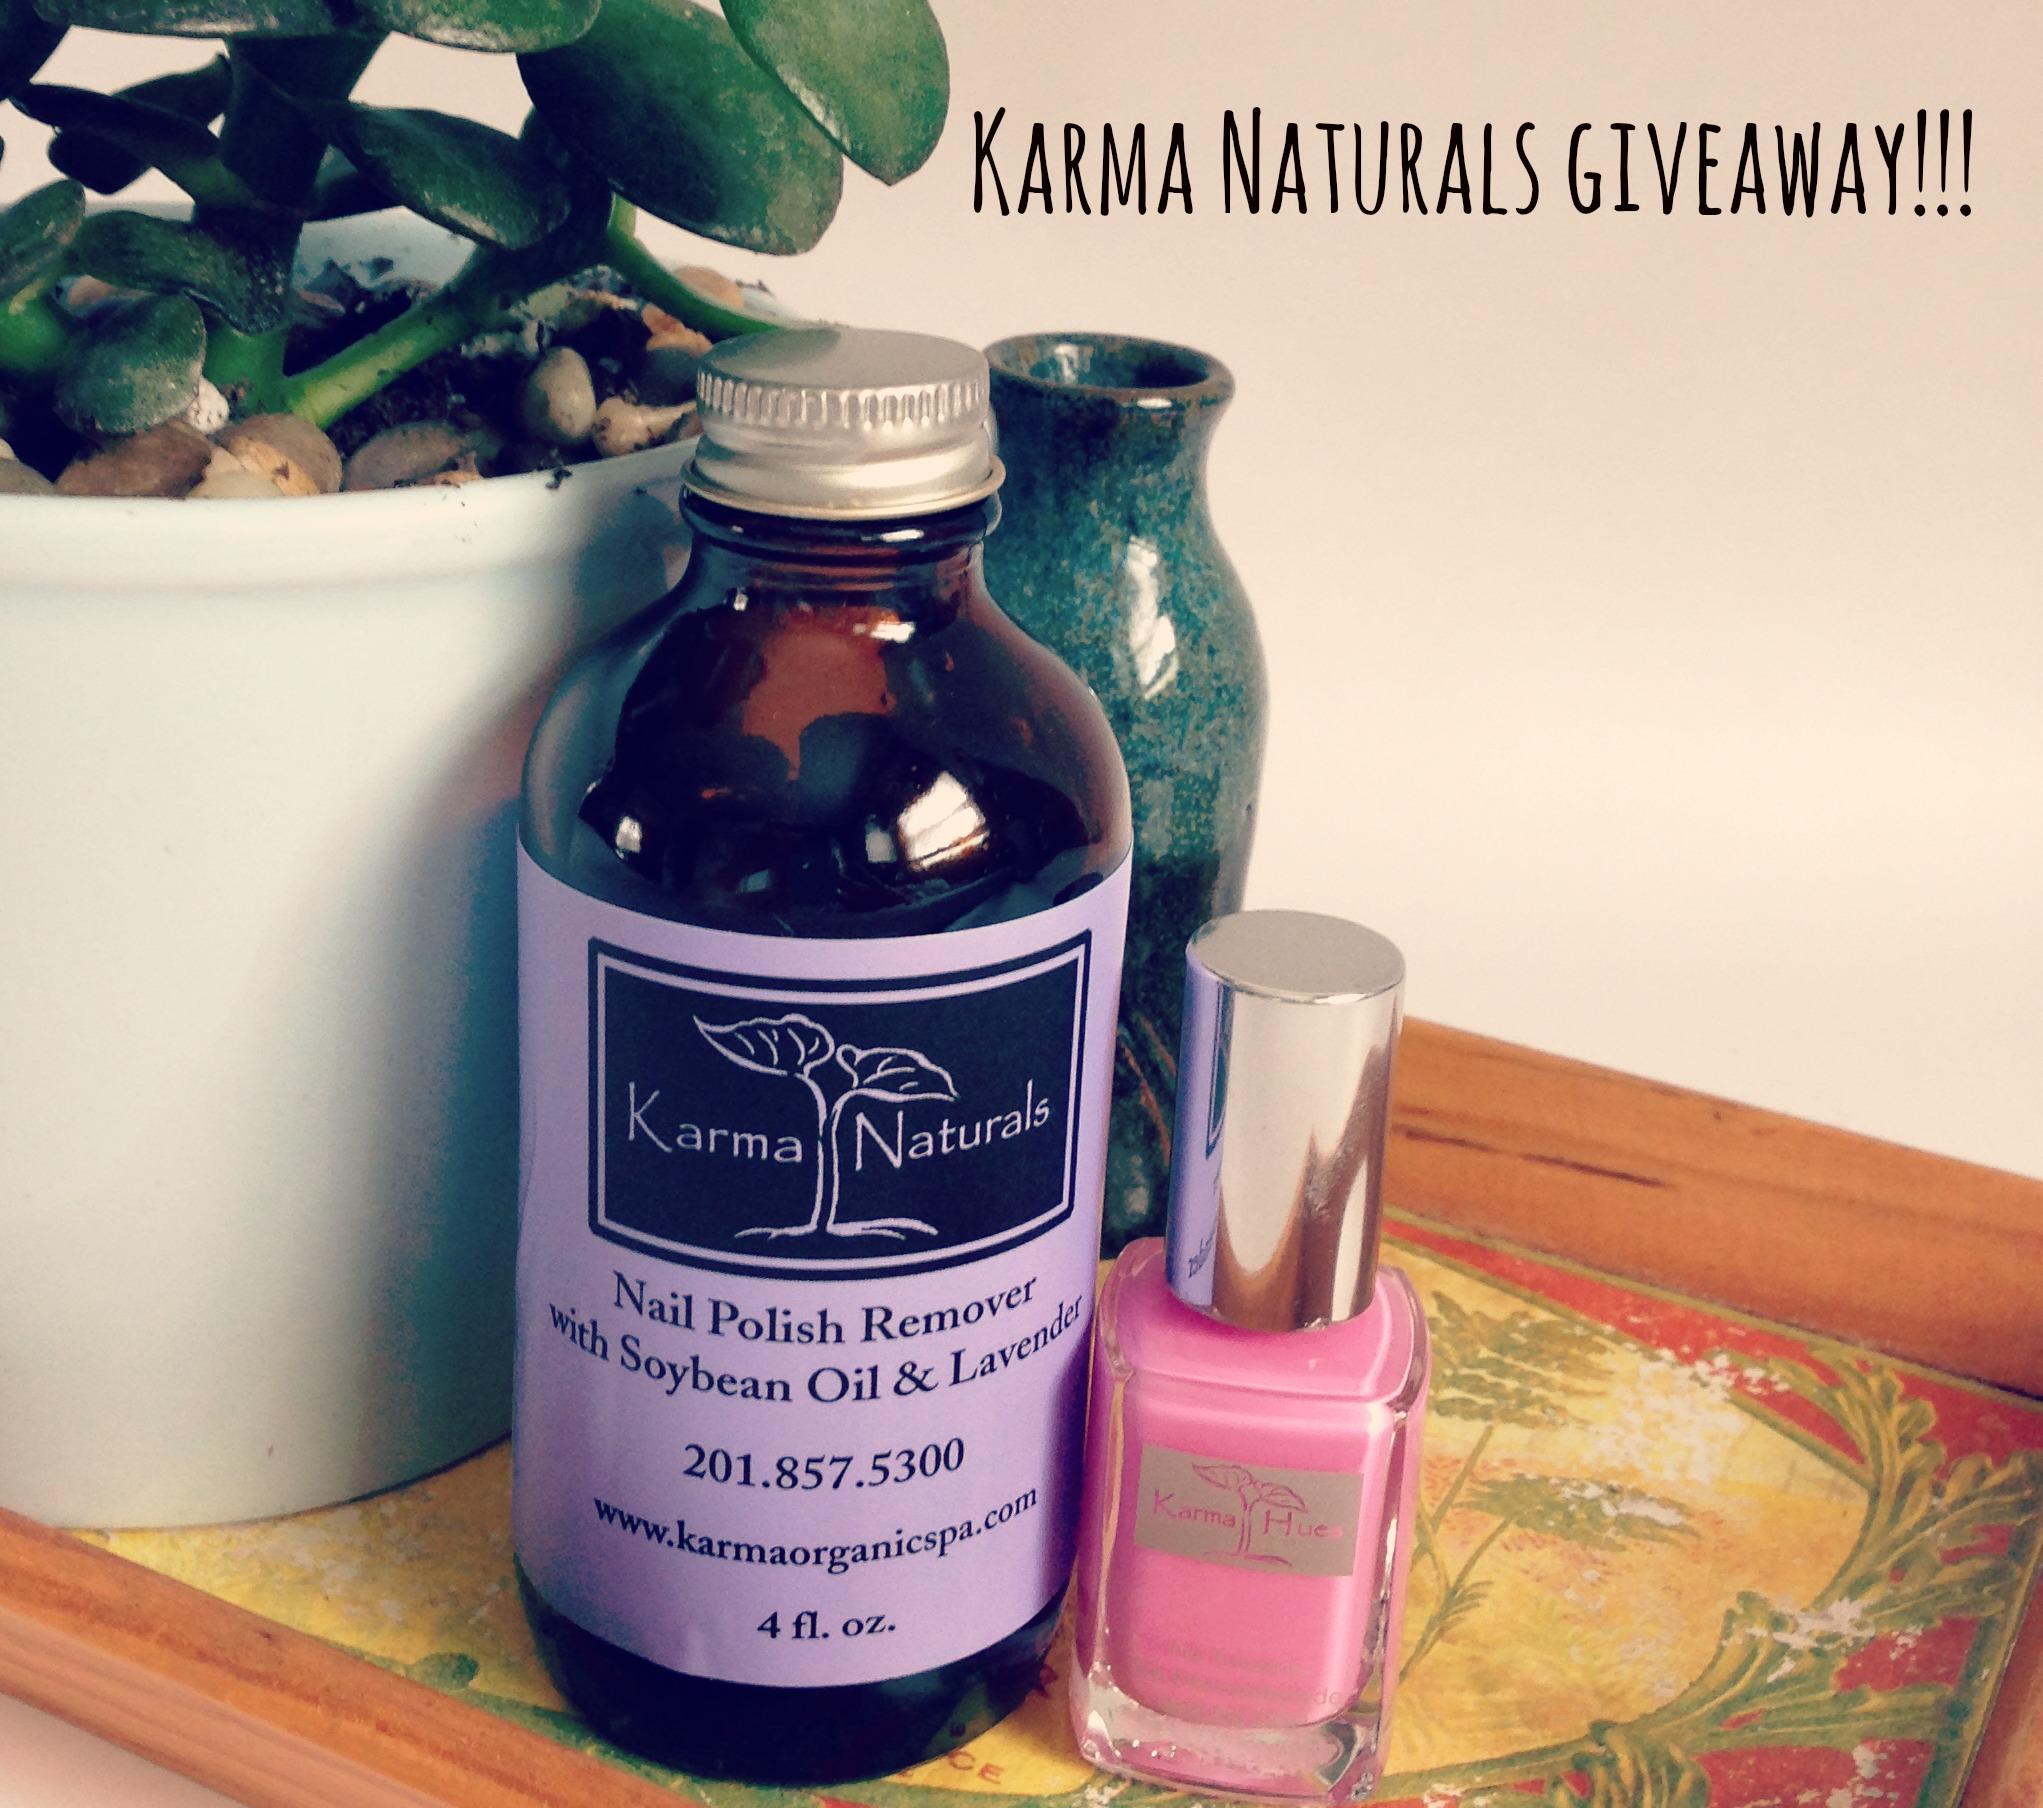 karma naturals giveaway